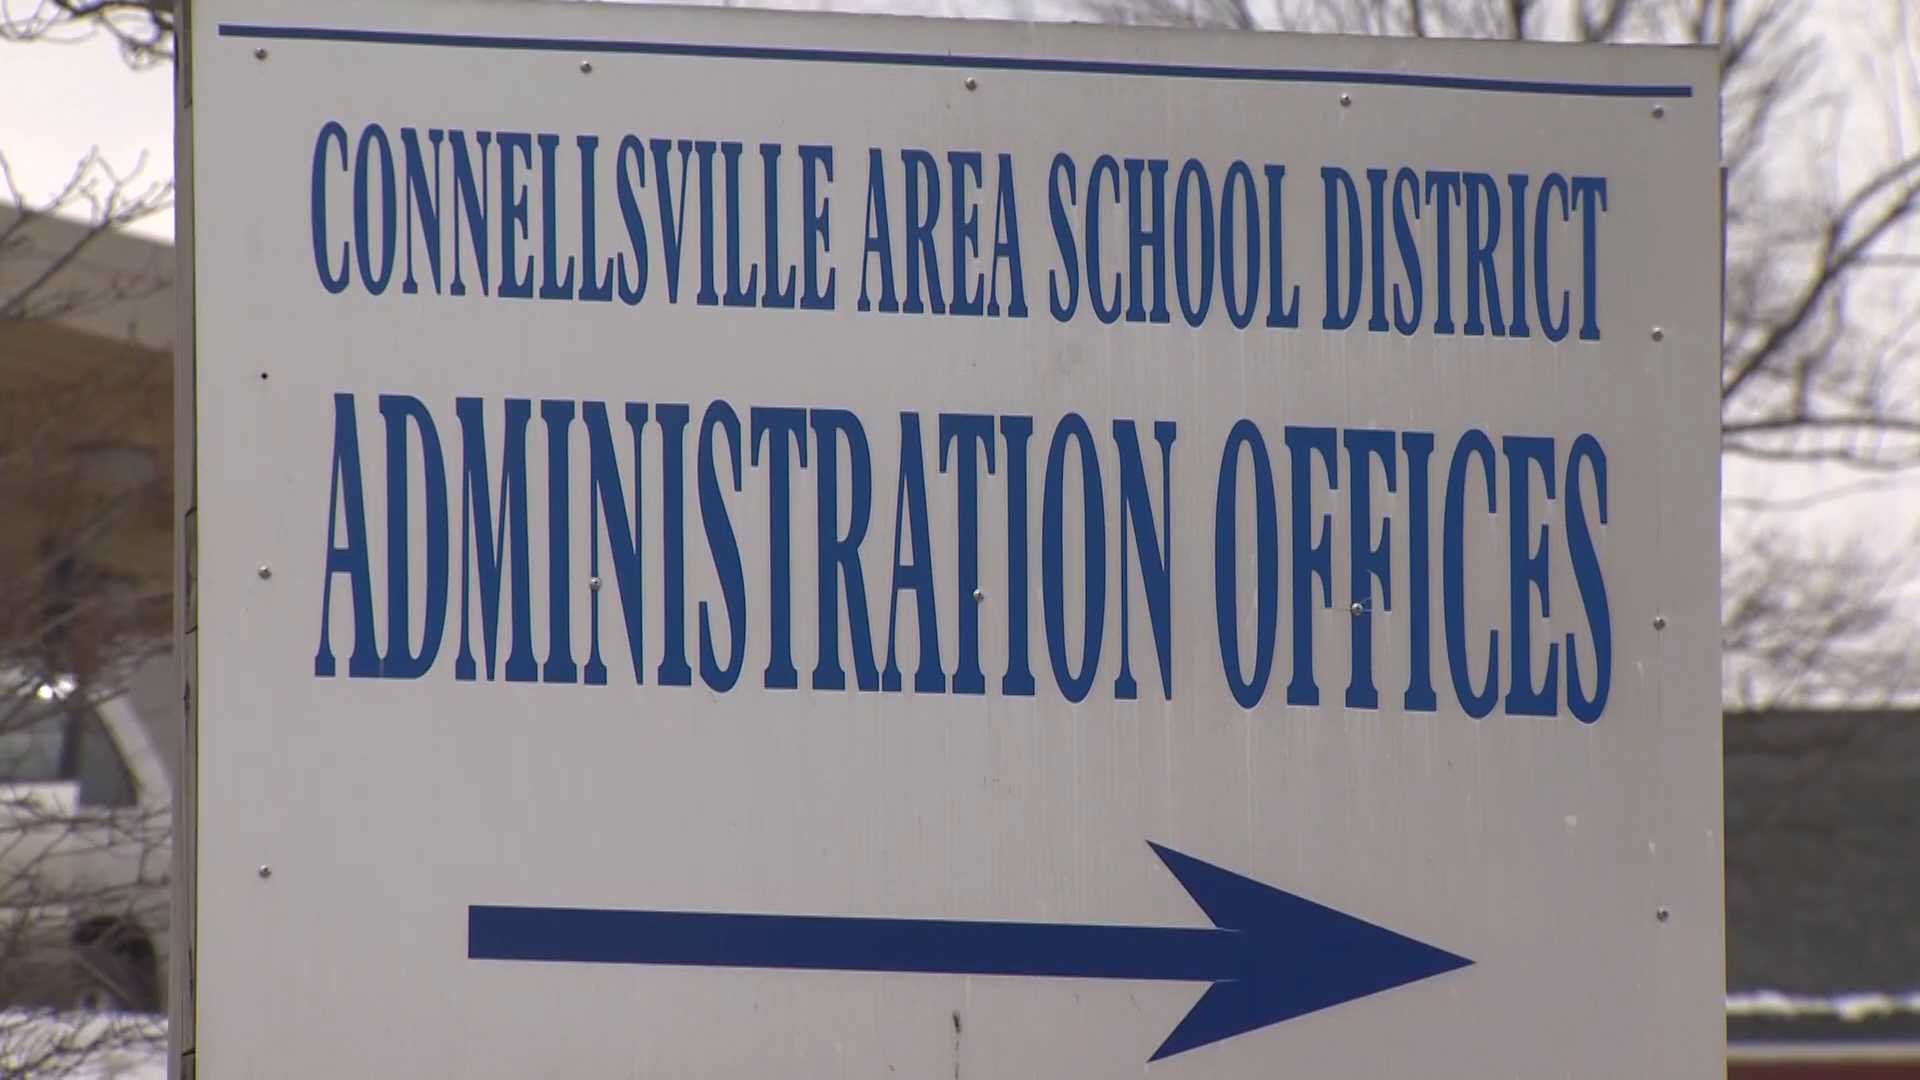 Connellsville Area School District